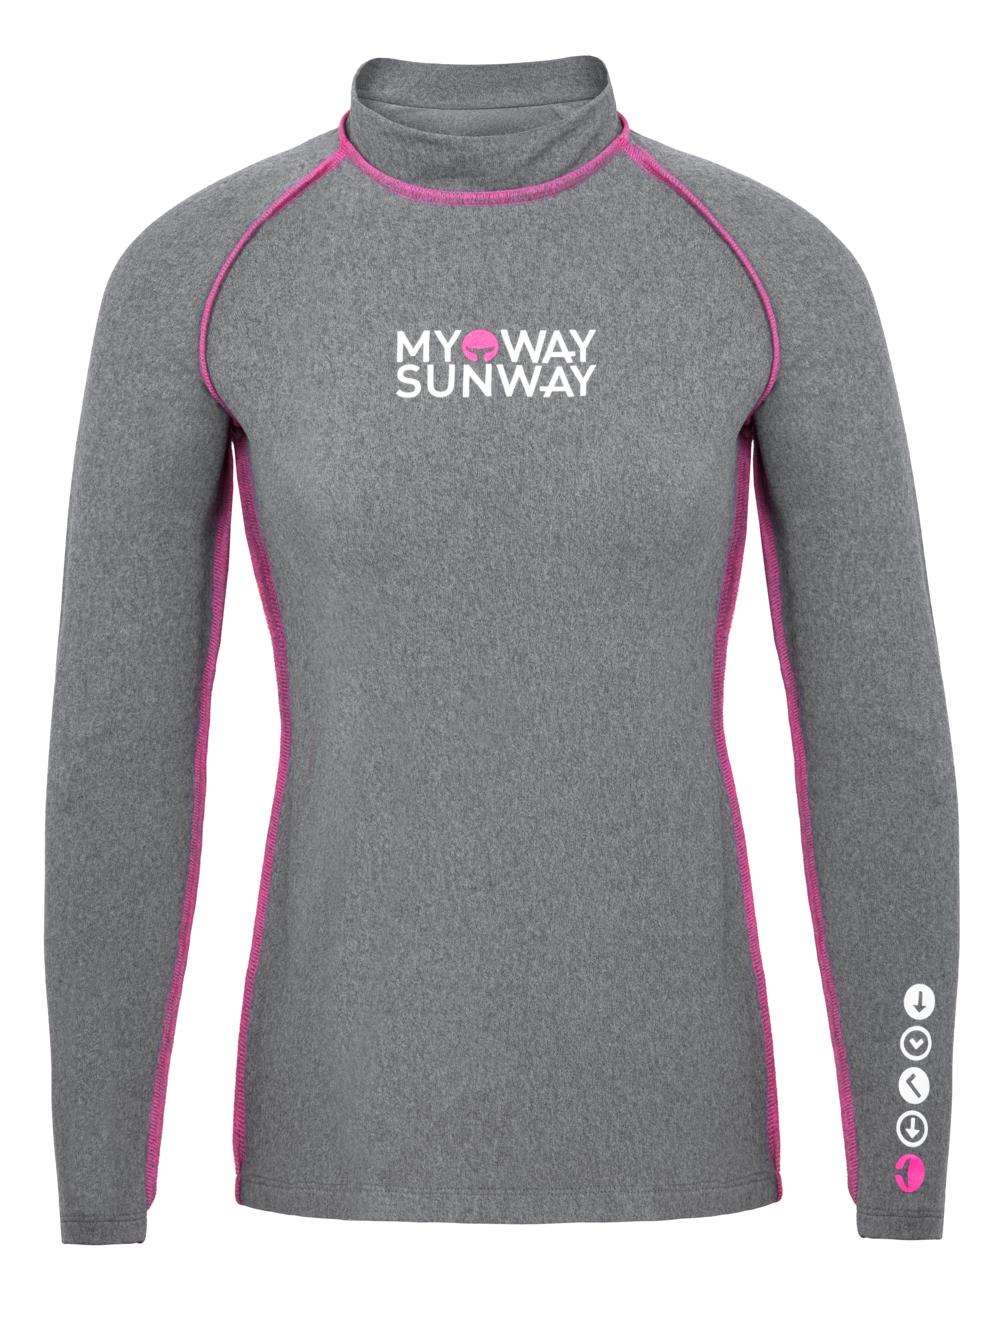 Thermal Lycra Fleece Shirt - Gray Pink / Black